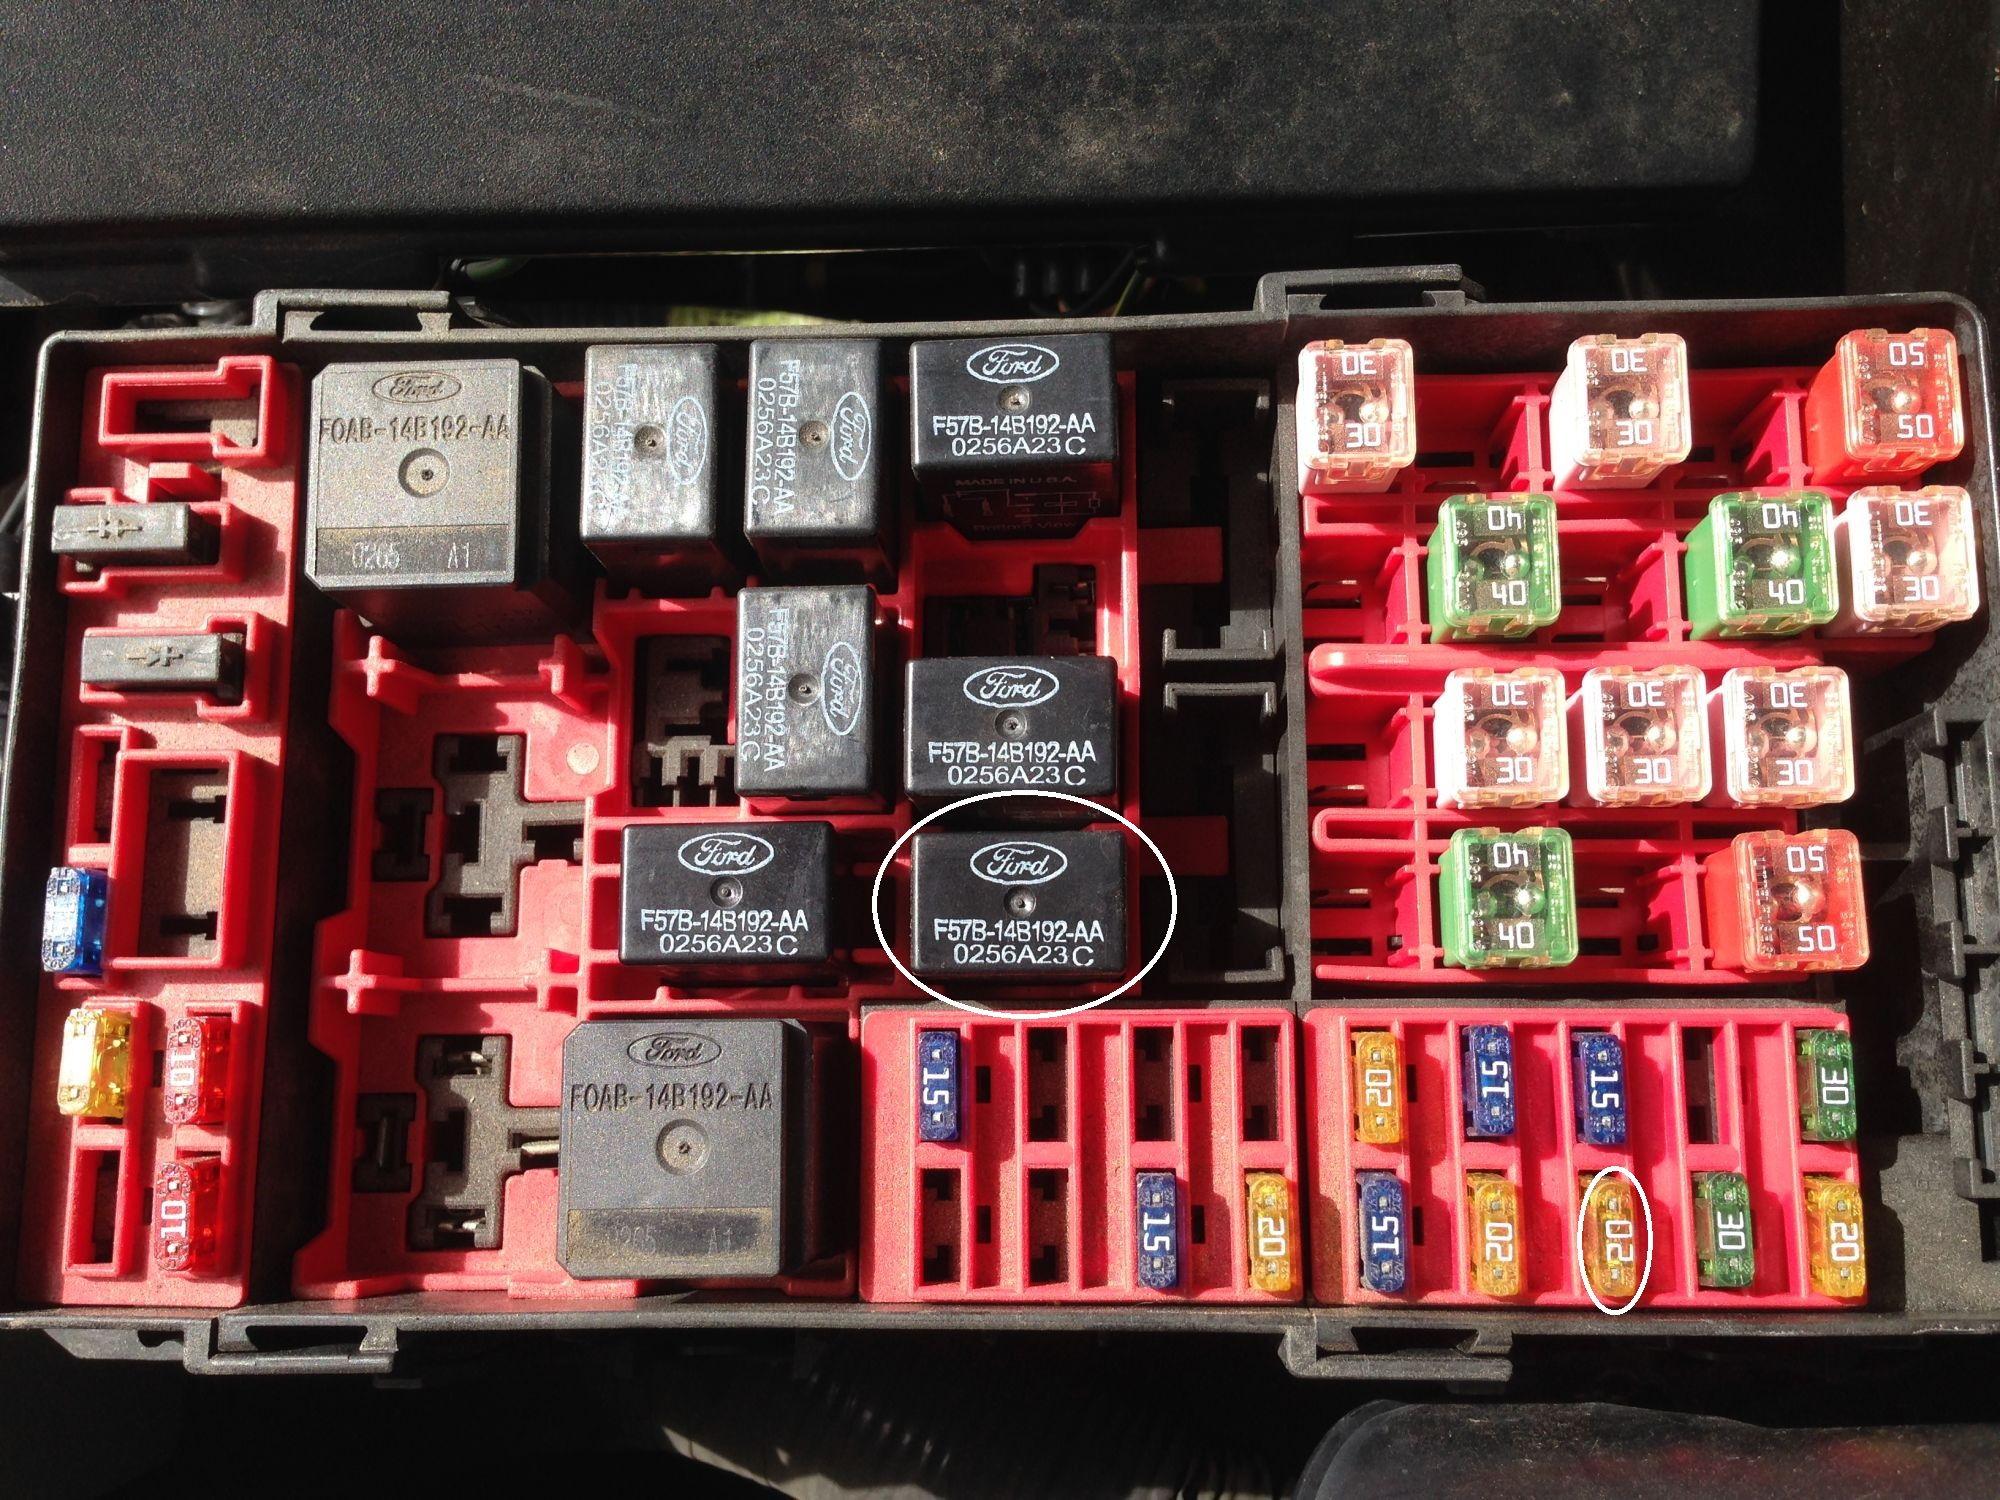 2007 ford f150 trailer plug wiring diagram renault clio seat airbag gmc sierra running light fuse autos post